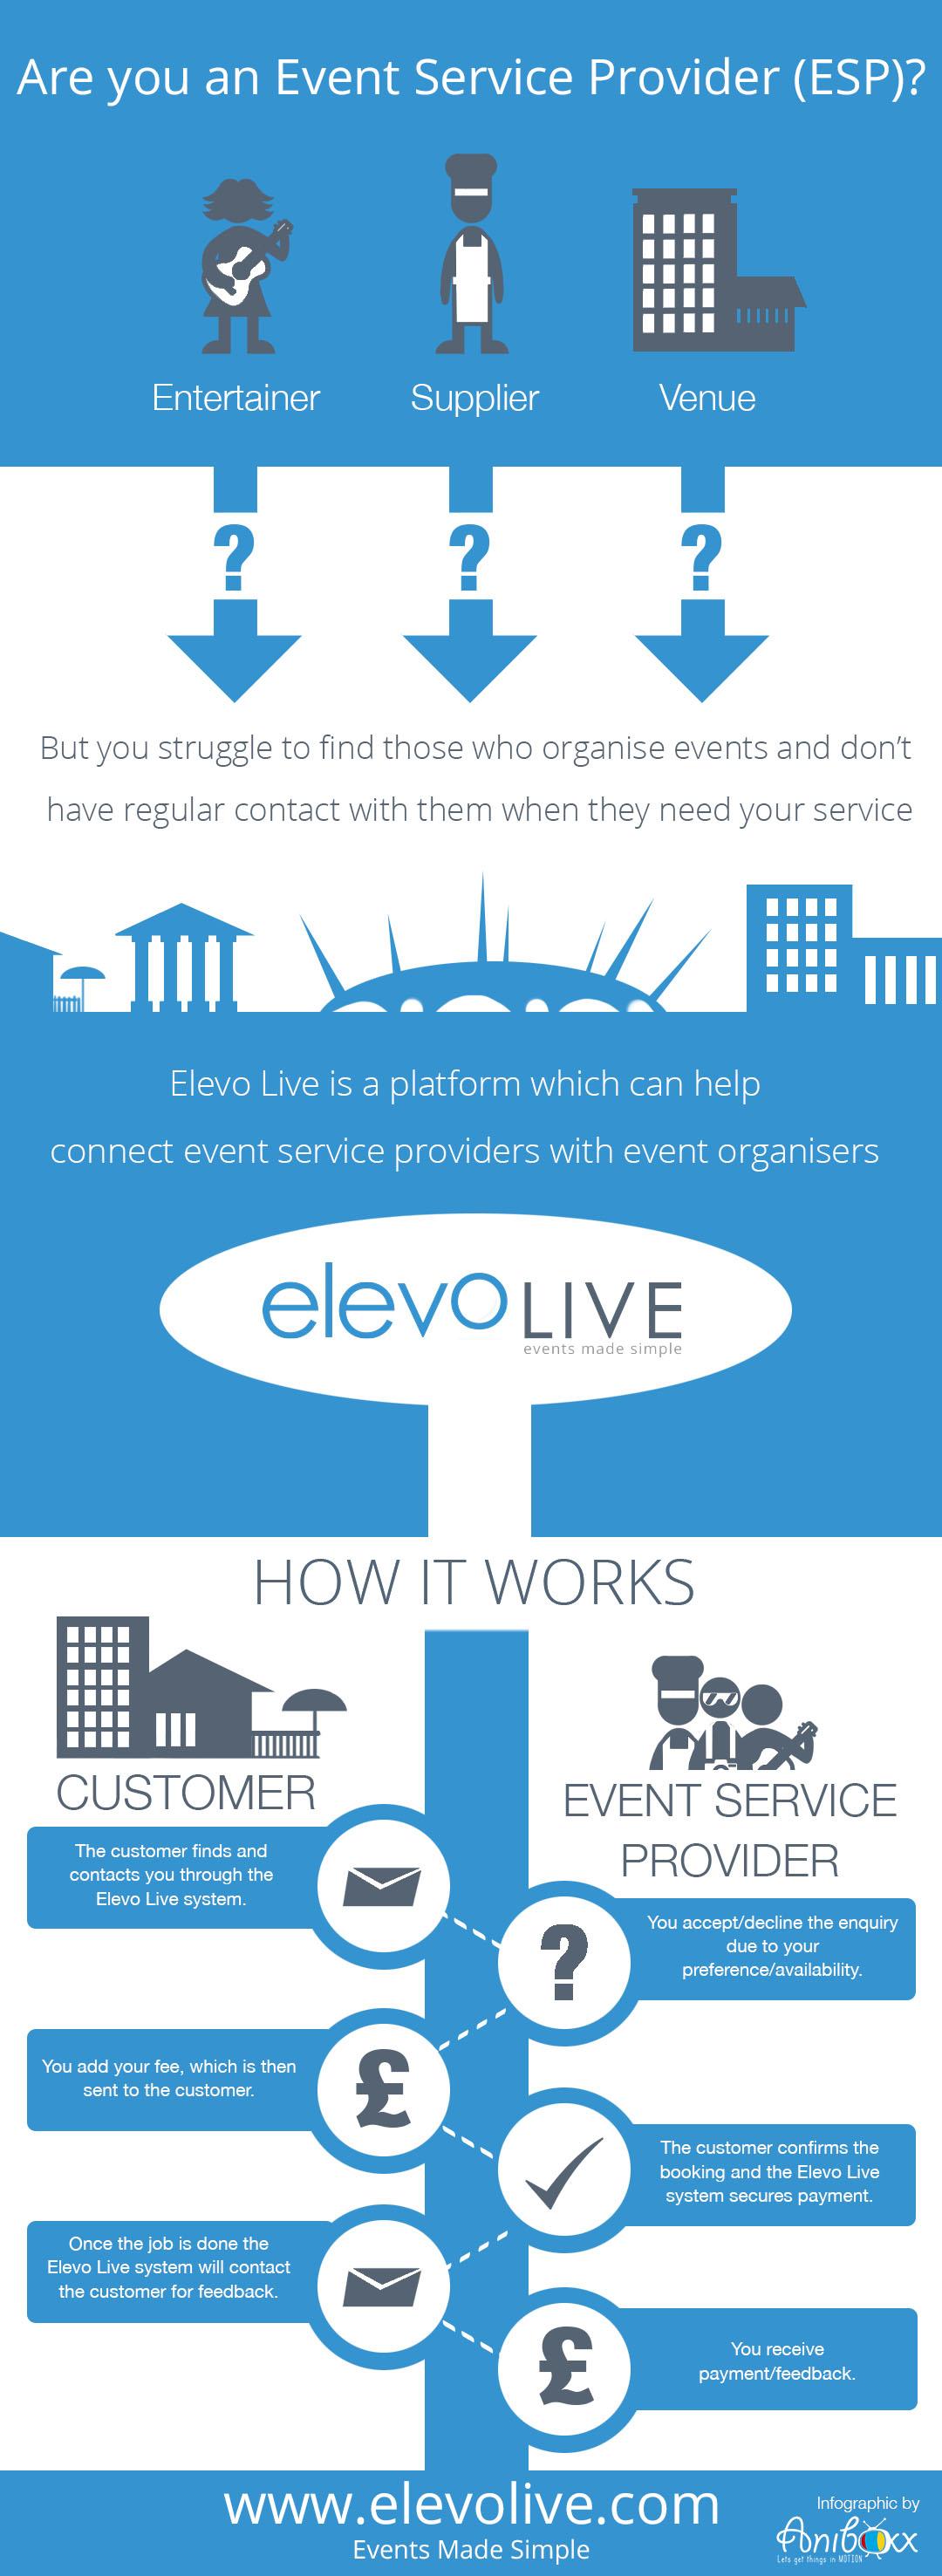 Elevolive Infographic